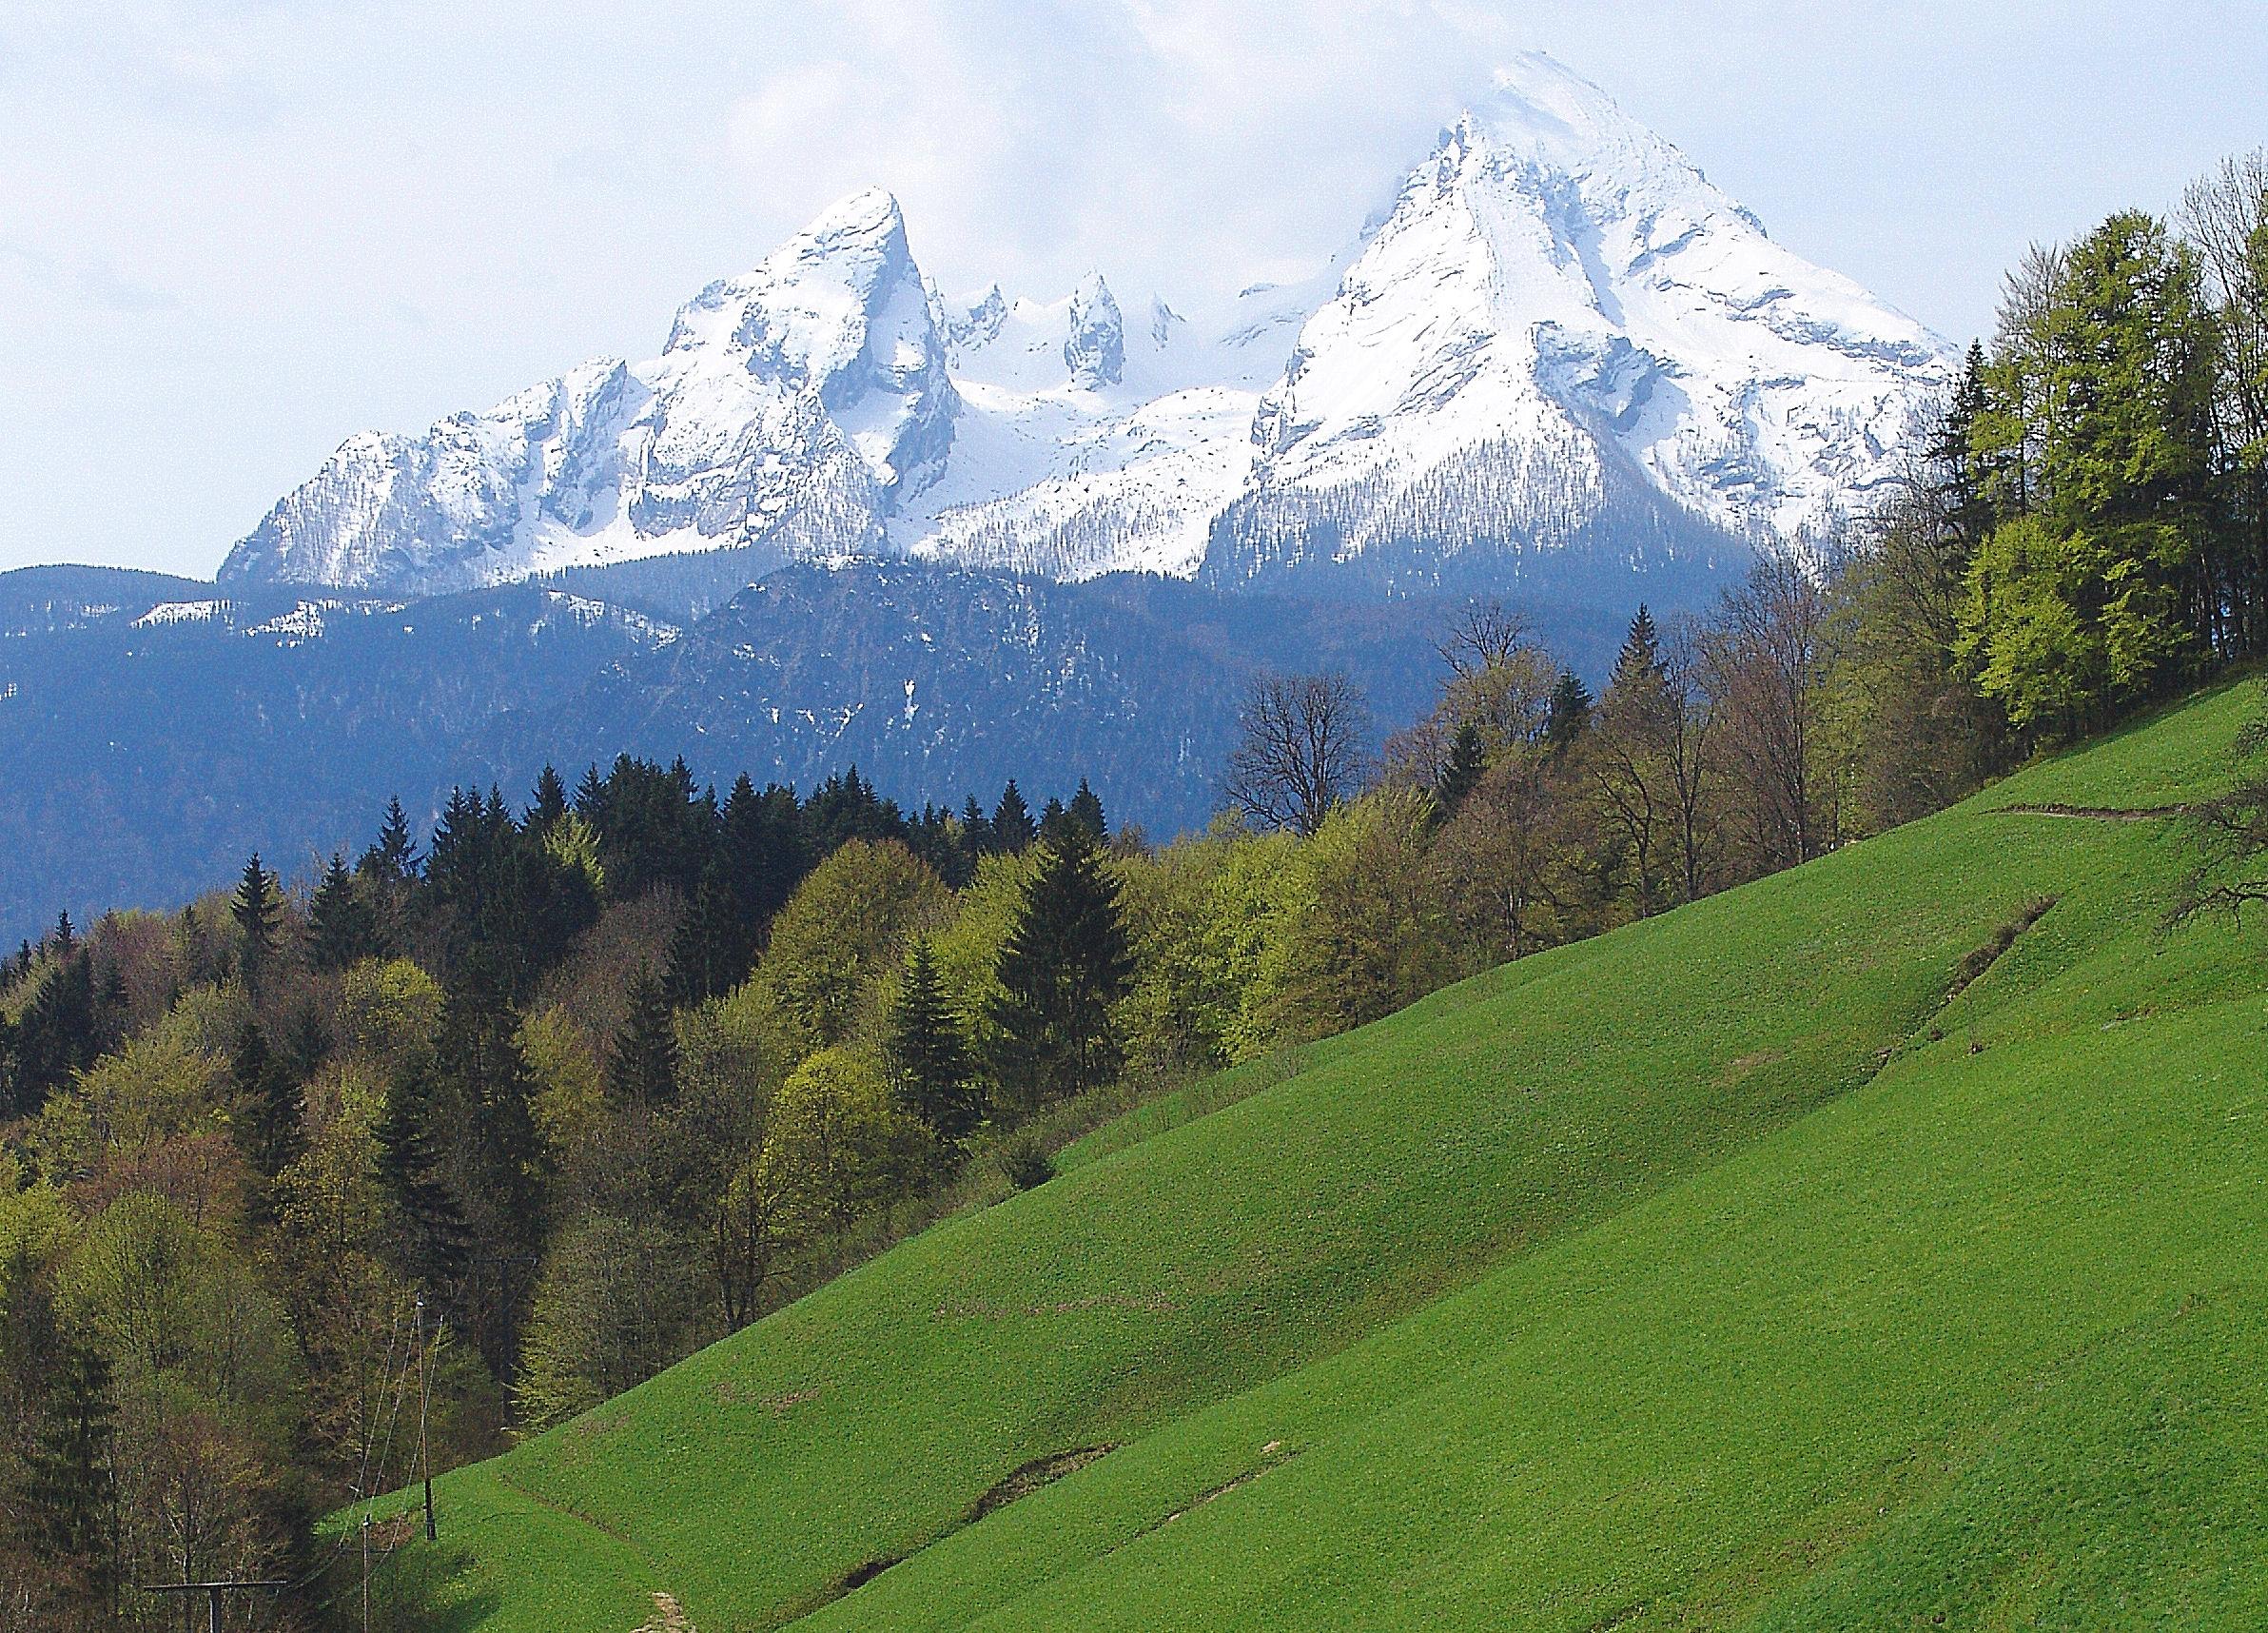 https://i0.wp.com/upload.wikimedia.org/wikipedia/commons/0/00/Watzmann_bei_Berchtesgaden,_Germany.jpg